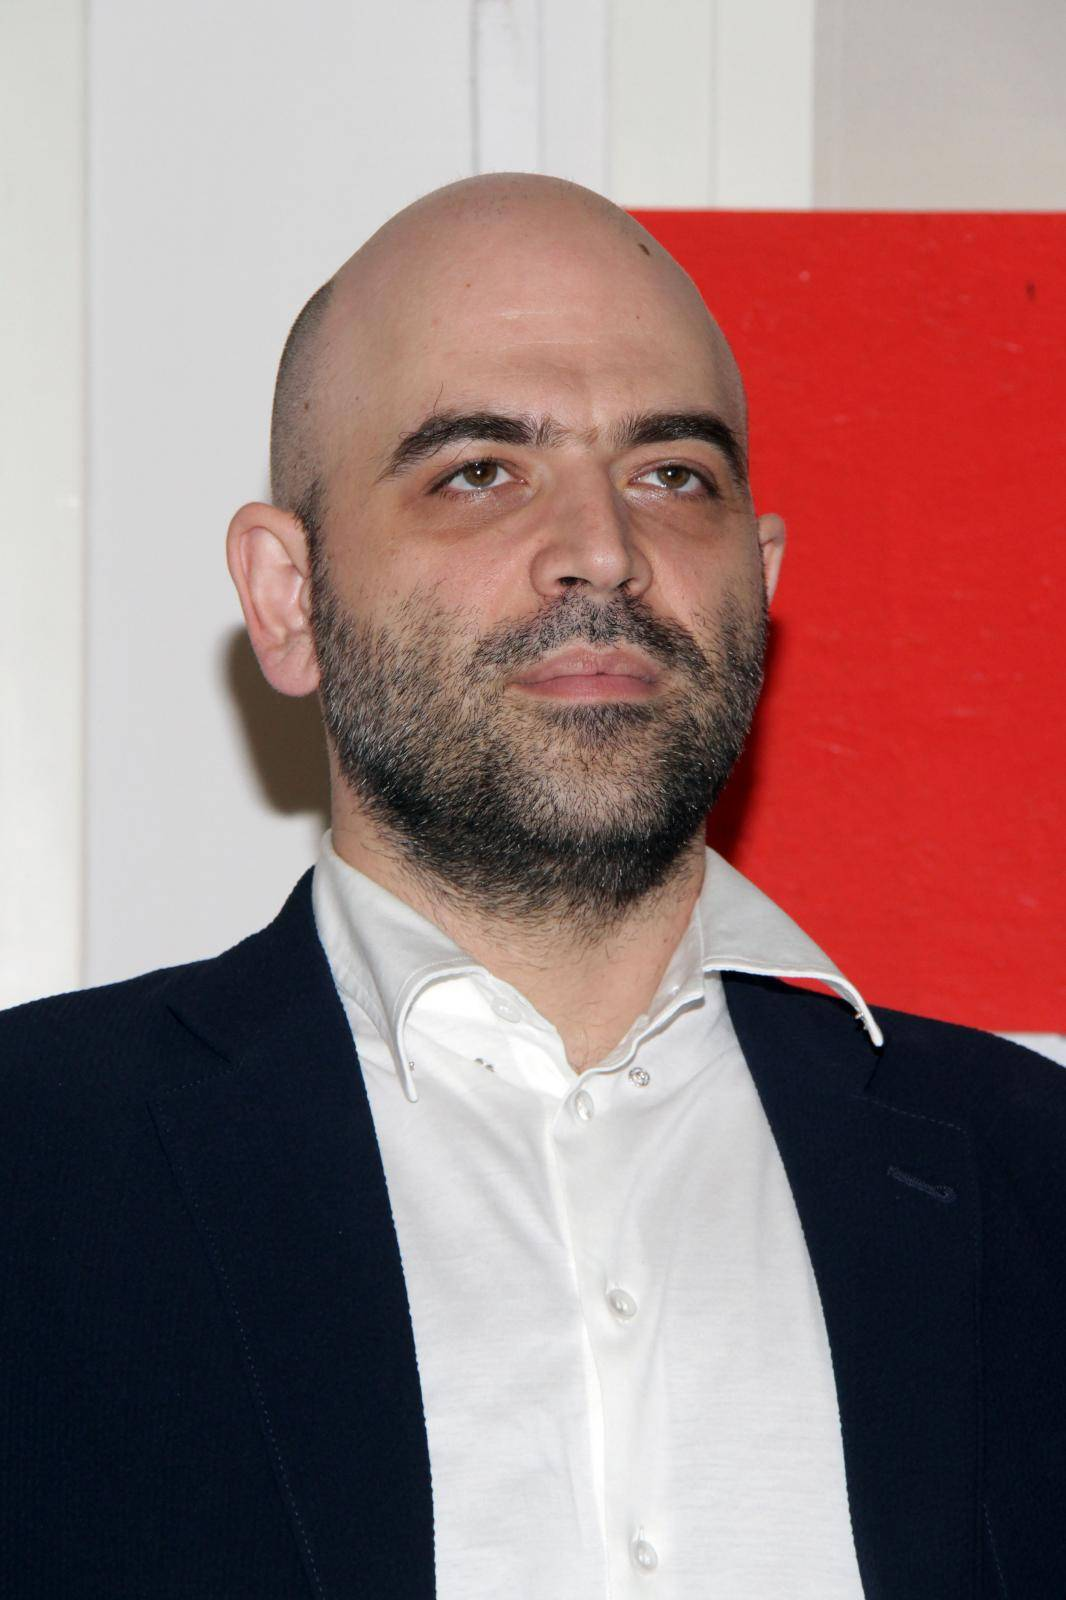 Milan, Smemoranda 2020 presentation